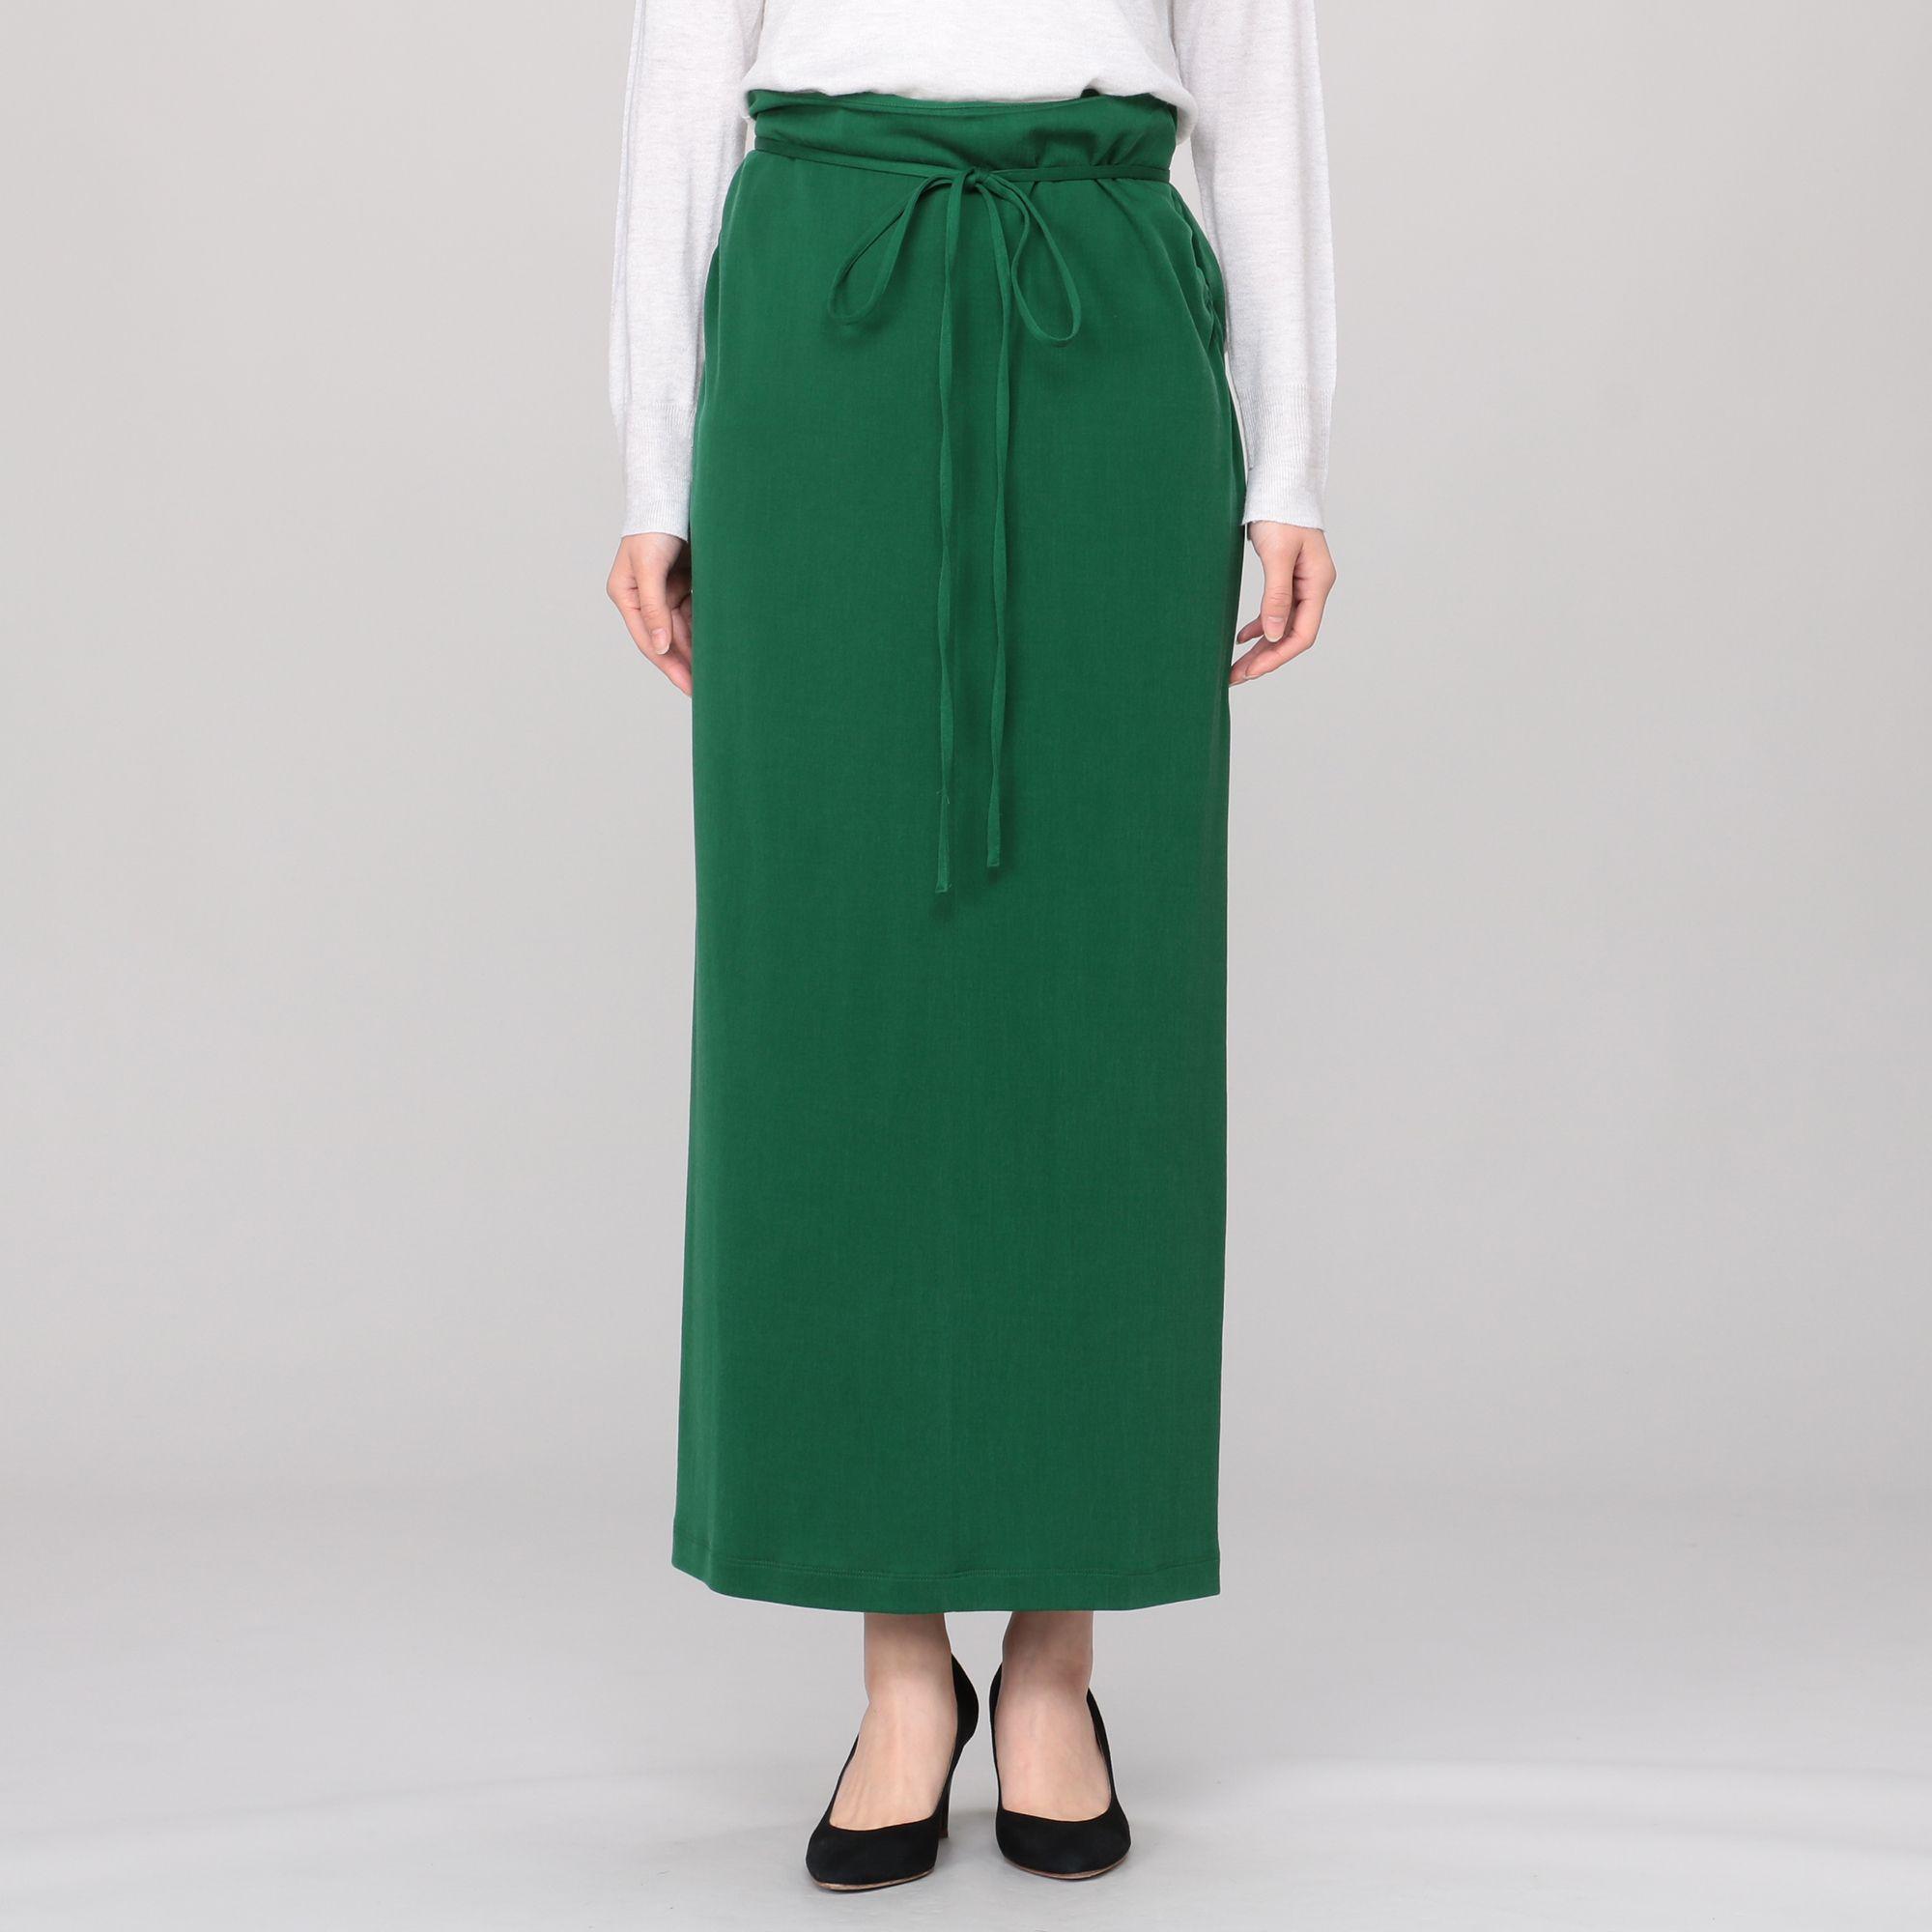 08sircus08サーカス/Fibril cupra double knit maxi skirt